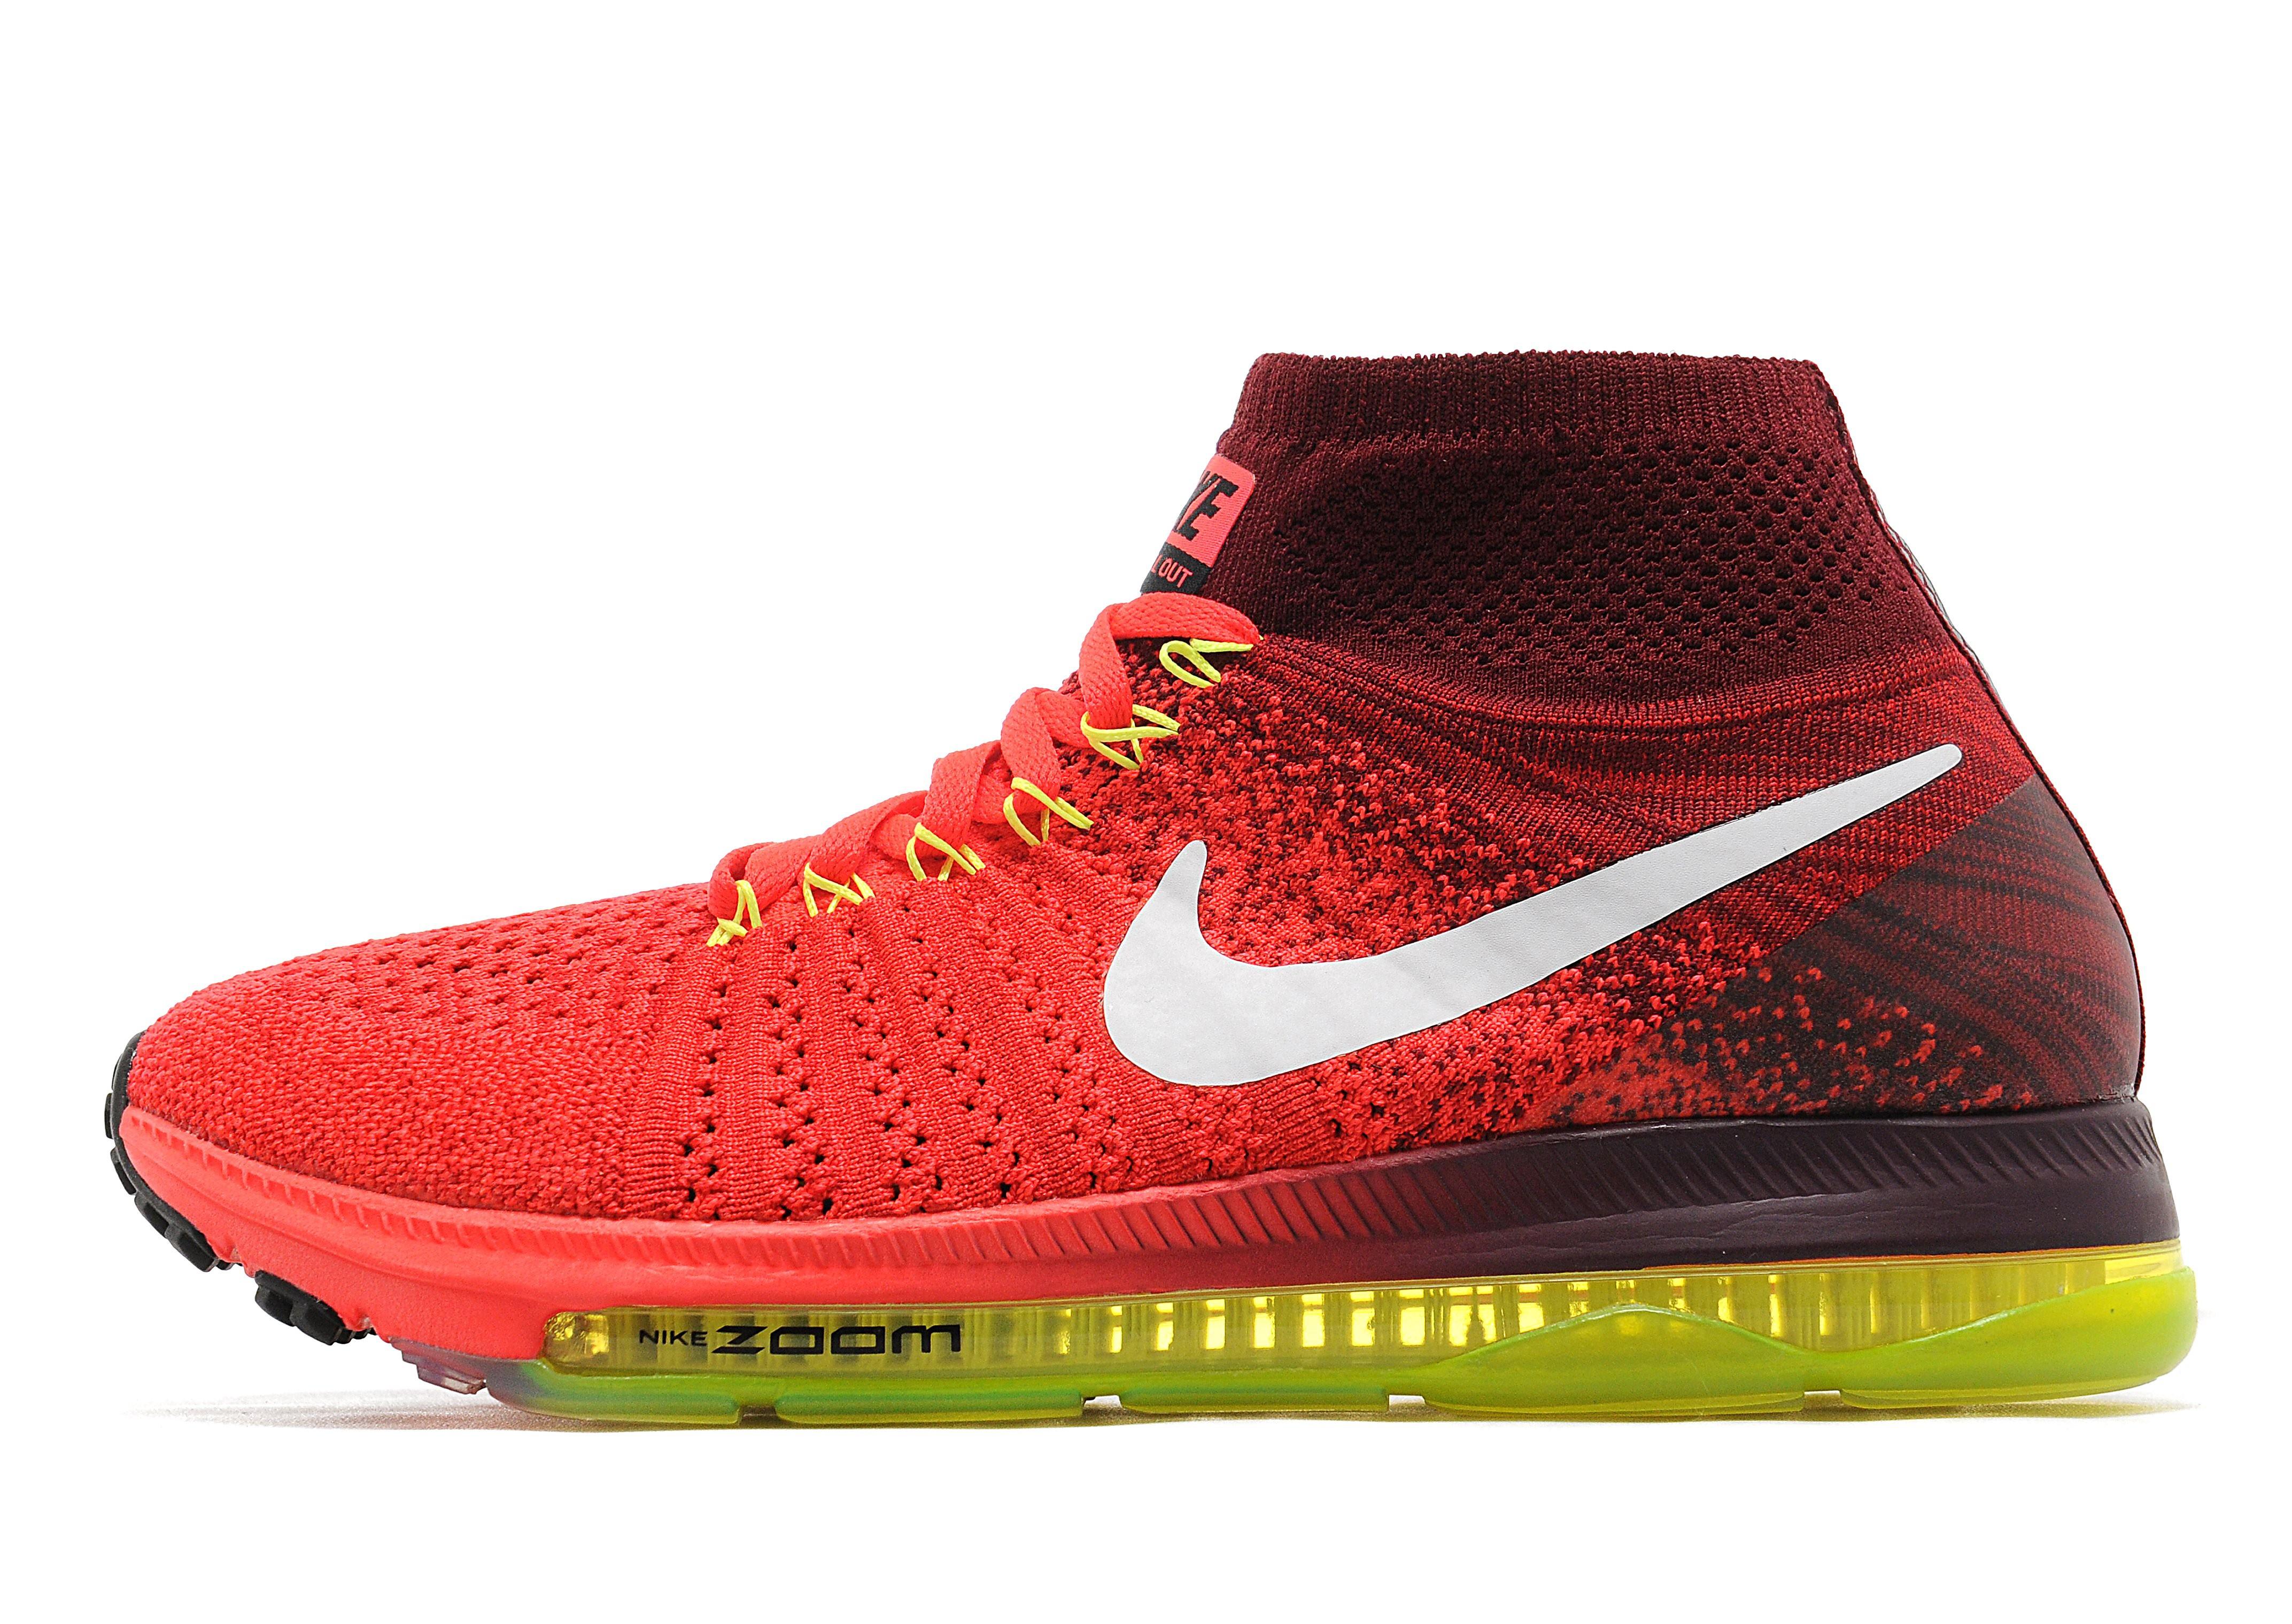 Nike Zoom All Out Flyknit Women's